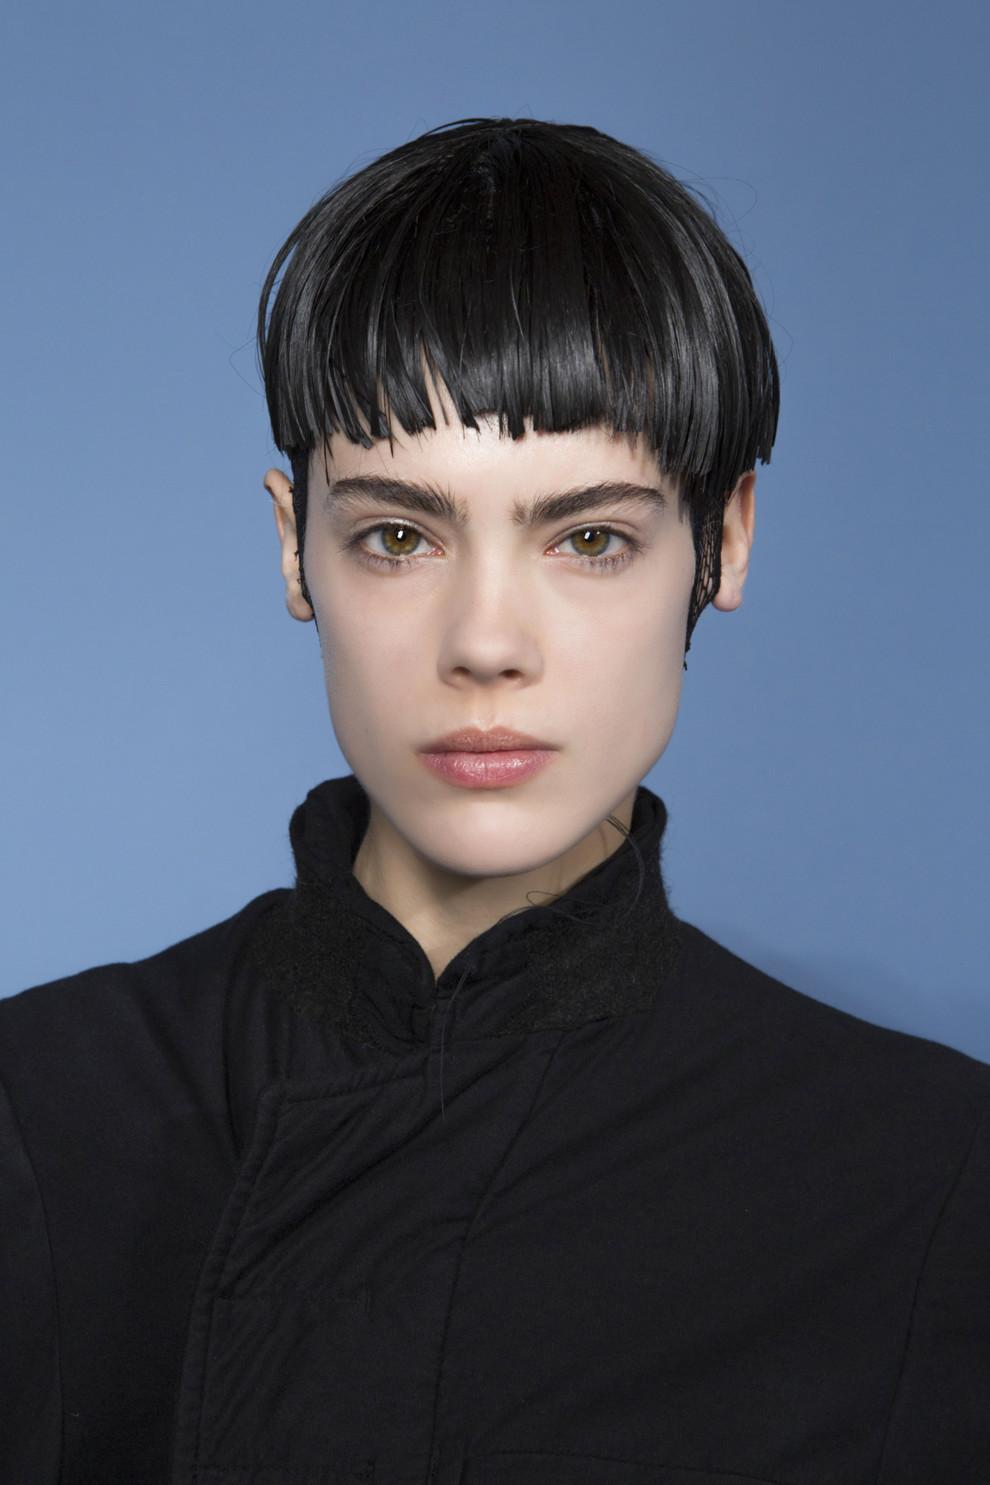 Антитренды макияжа 2020: Четкие брови